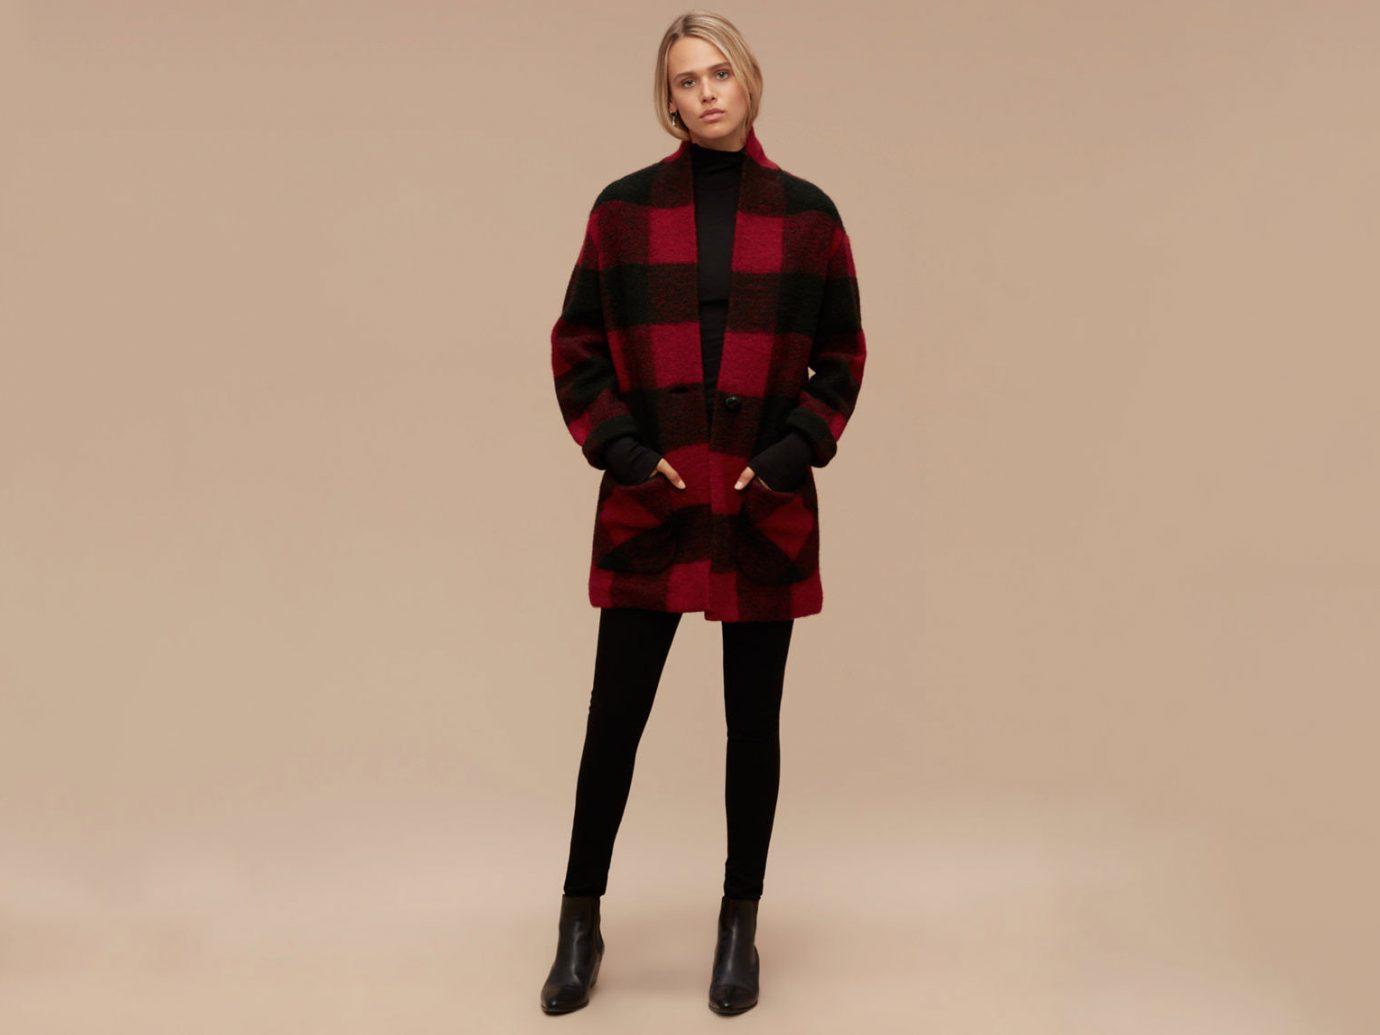 Style + Design clothing red standing pattern tartan sleeve Design fashion outerwear dress textile photo shoot wool posing